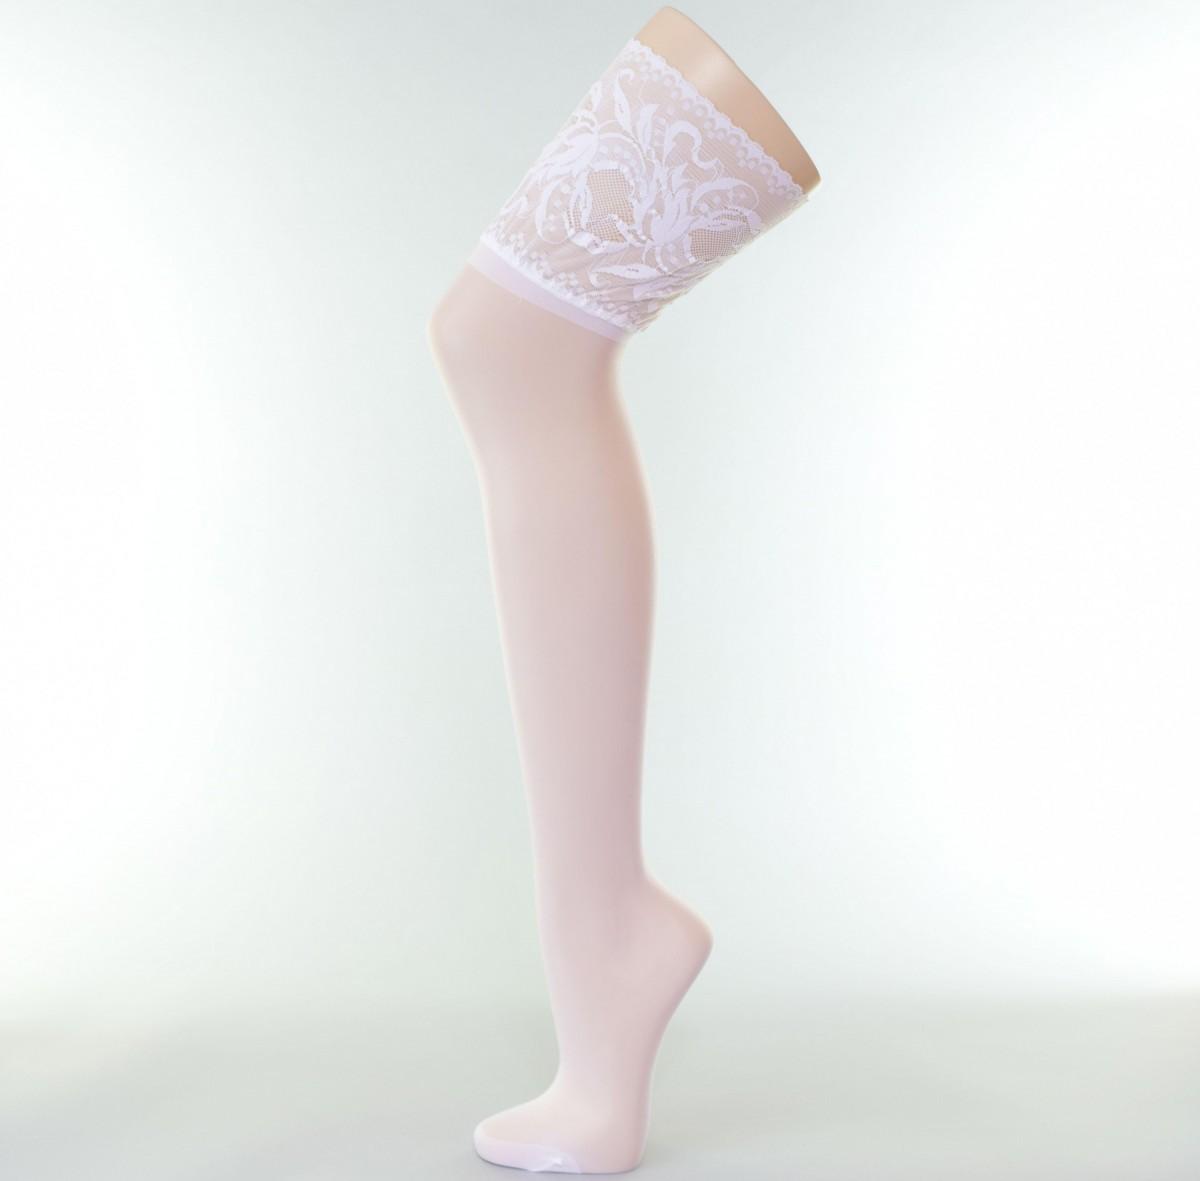 Capriccio perreg 12 цвет bianco